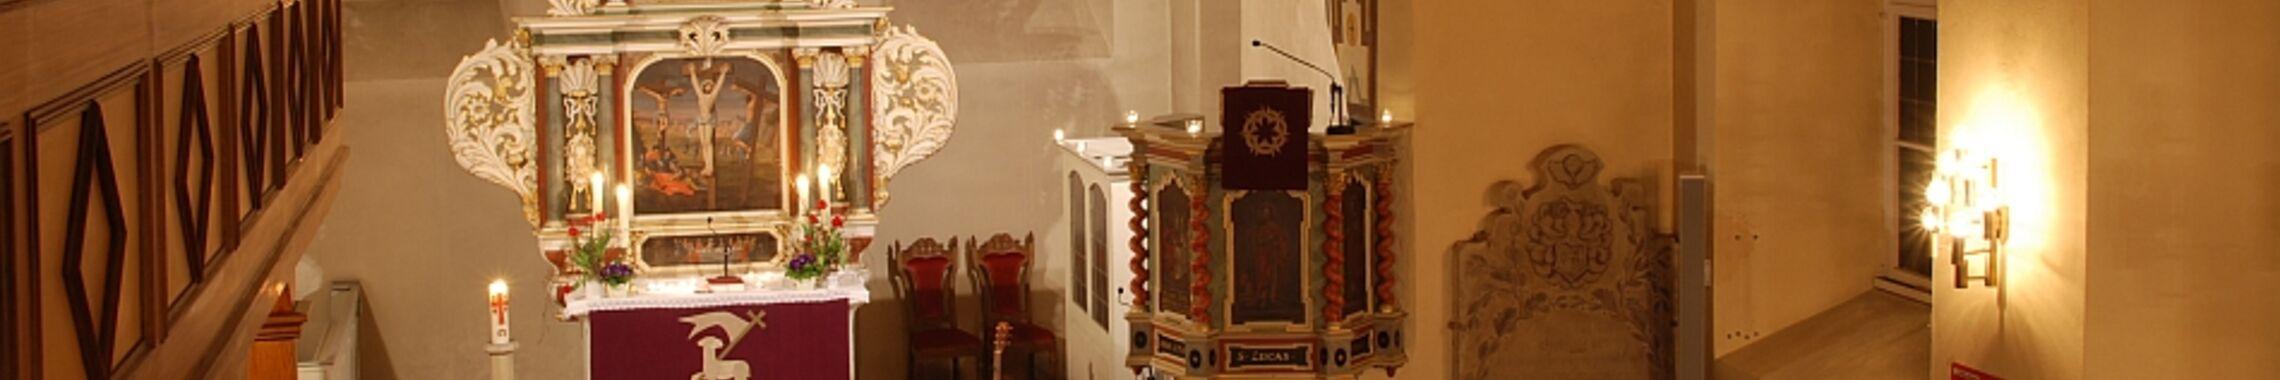 St. Adrian Heiligendorf